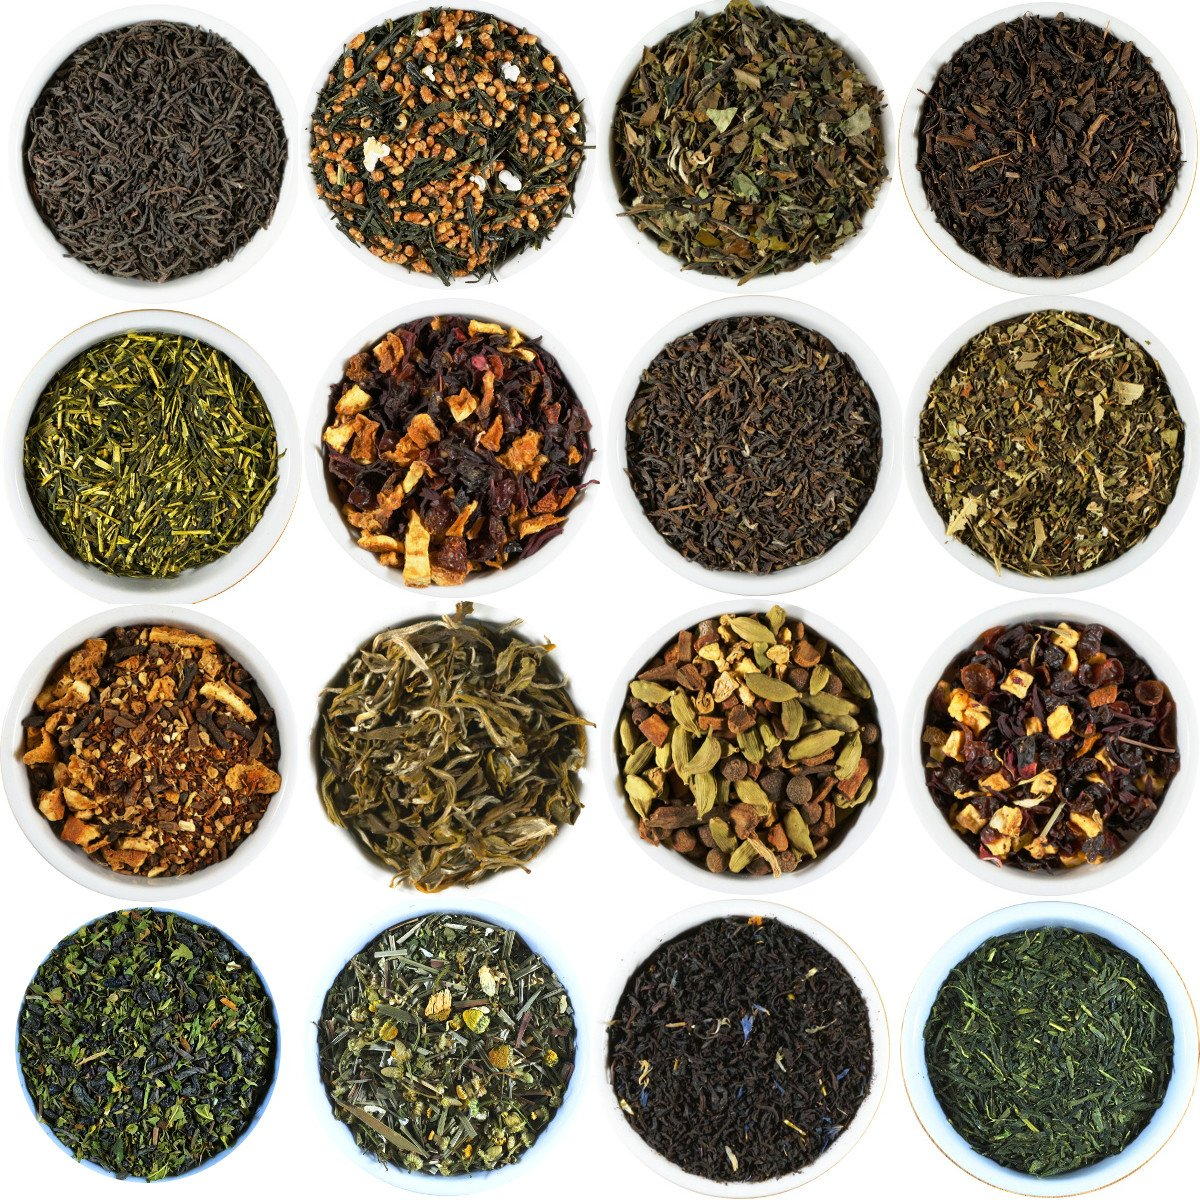 Cherry Blossom Green Tea Sampler. Choose From 68 Varieties Of Loose Leaf Tea. Gourmet Tea Sampler Makes 3-5 Servings. Beantown Tea & Spices Brand. (Cherry Blossom Green Tea)